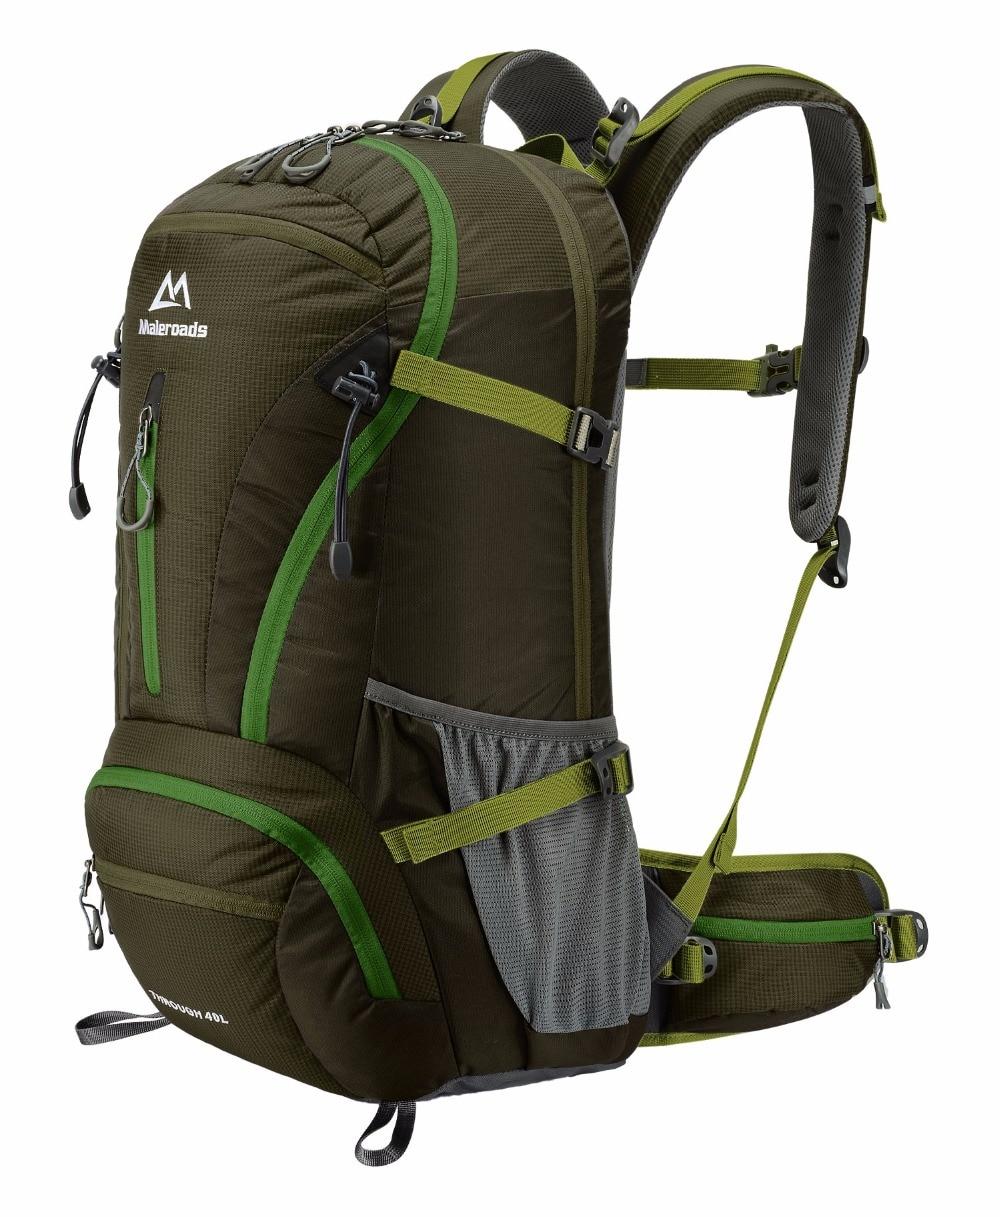 New Ultralight laptop Backpack Waterproof Nylon men Backpack women mochila Travel Bag Rucksack trekking bag Camp Hike Bagpack